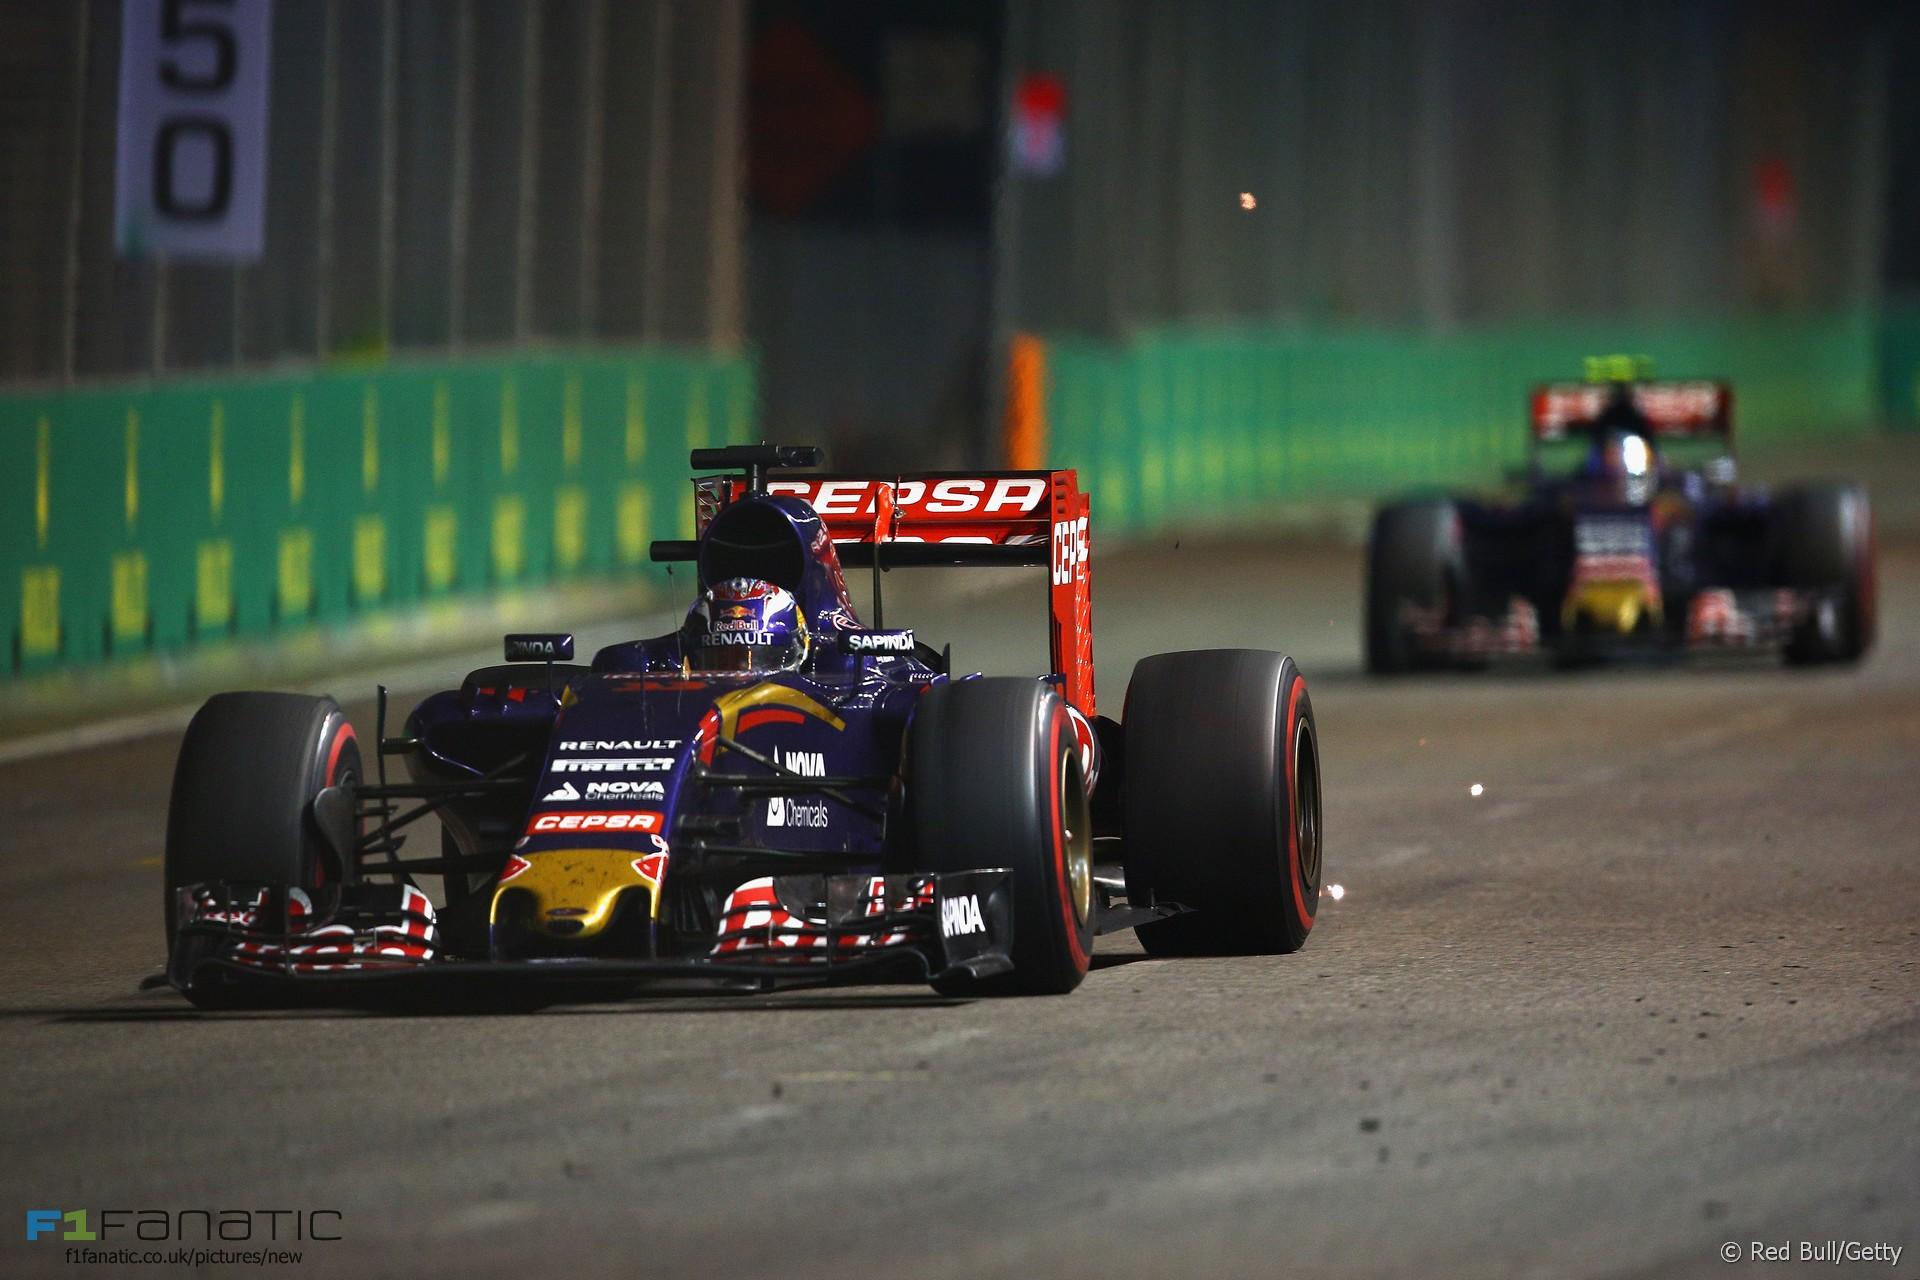 Max Verstappen, Toro Rosso, Singapore, 2015